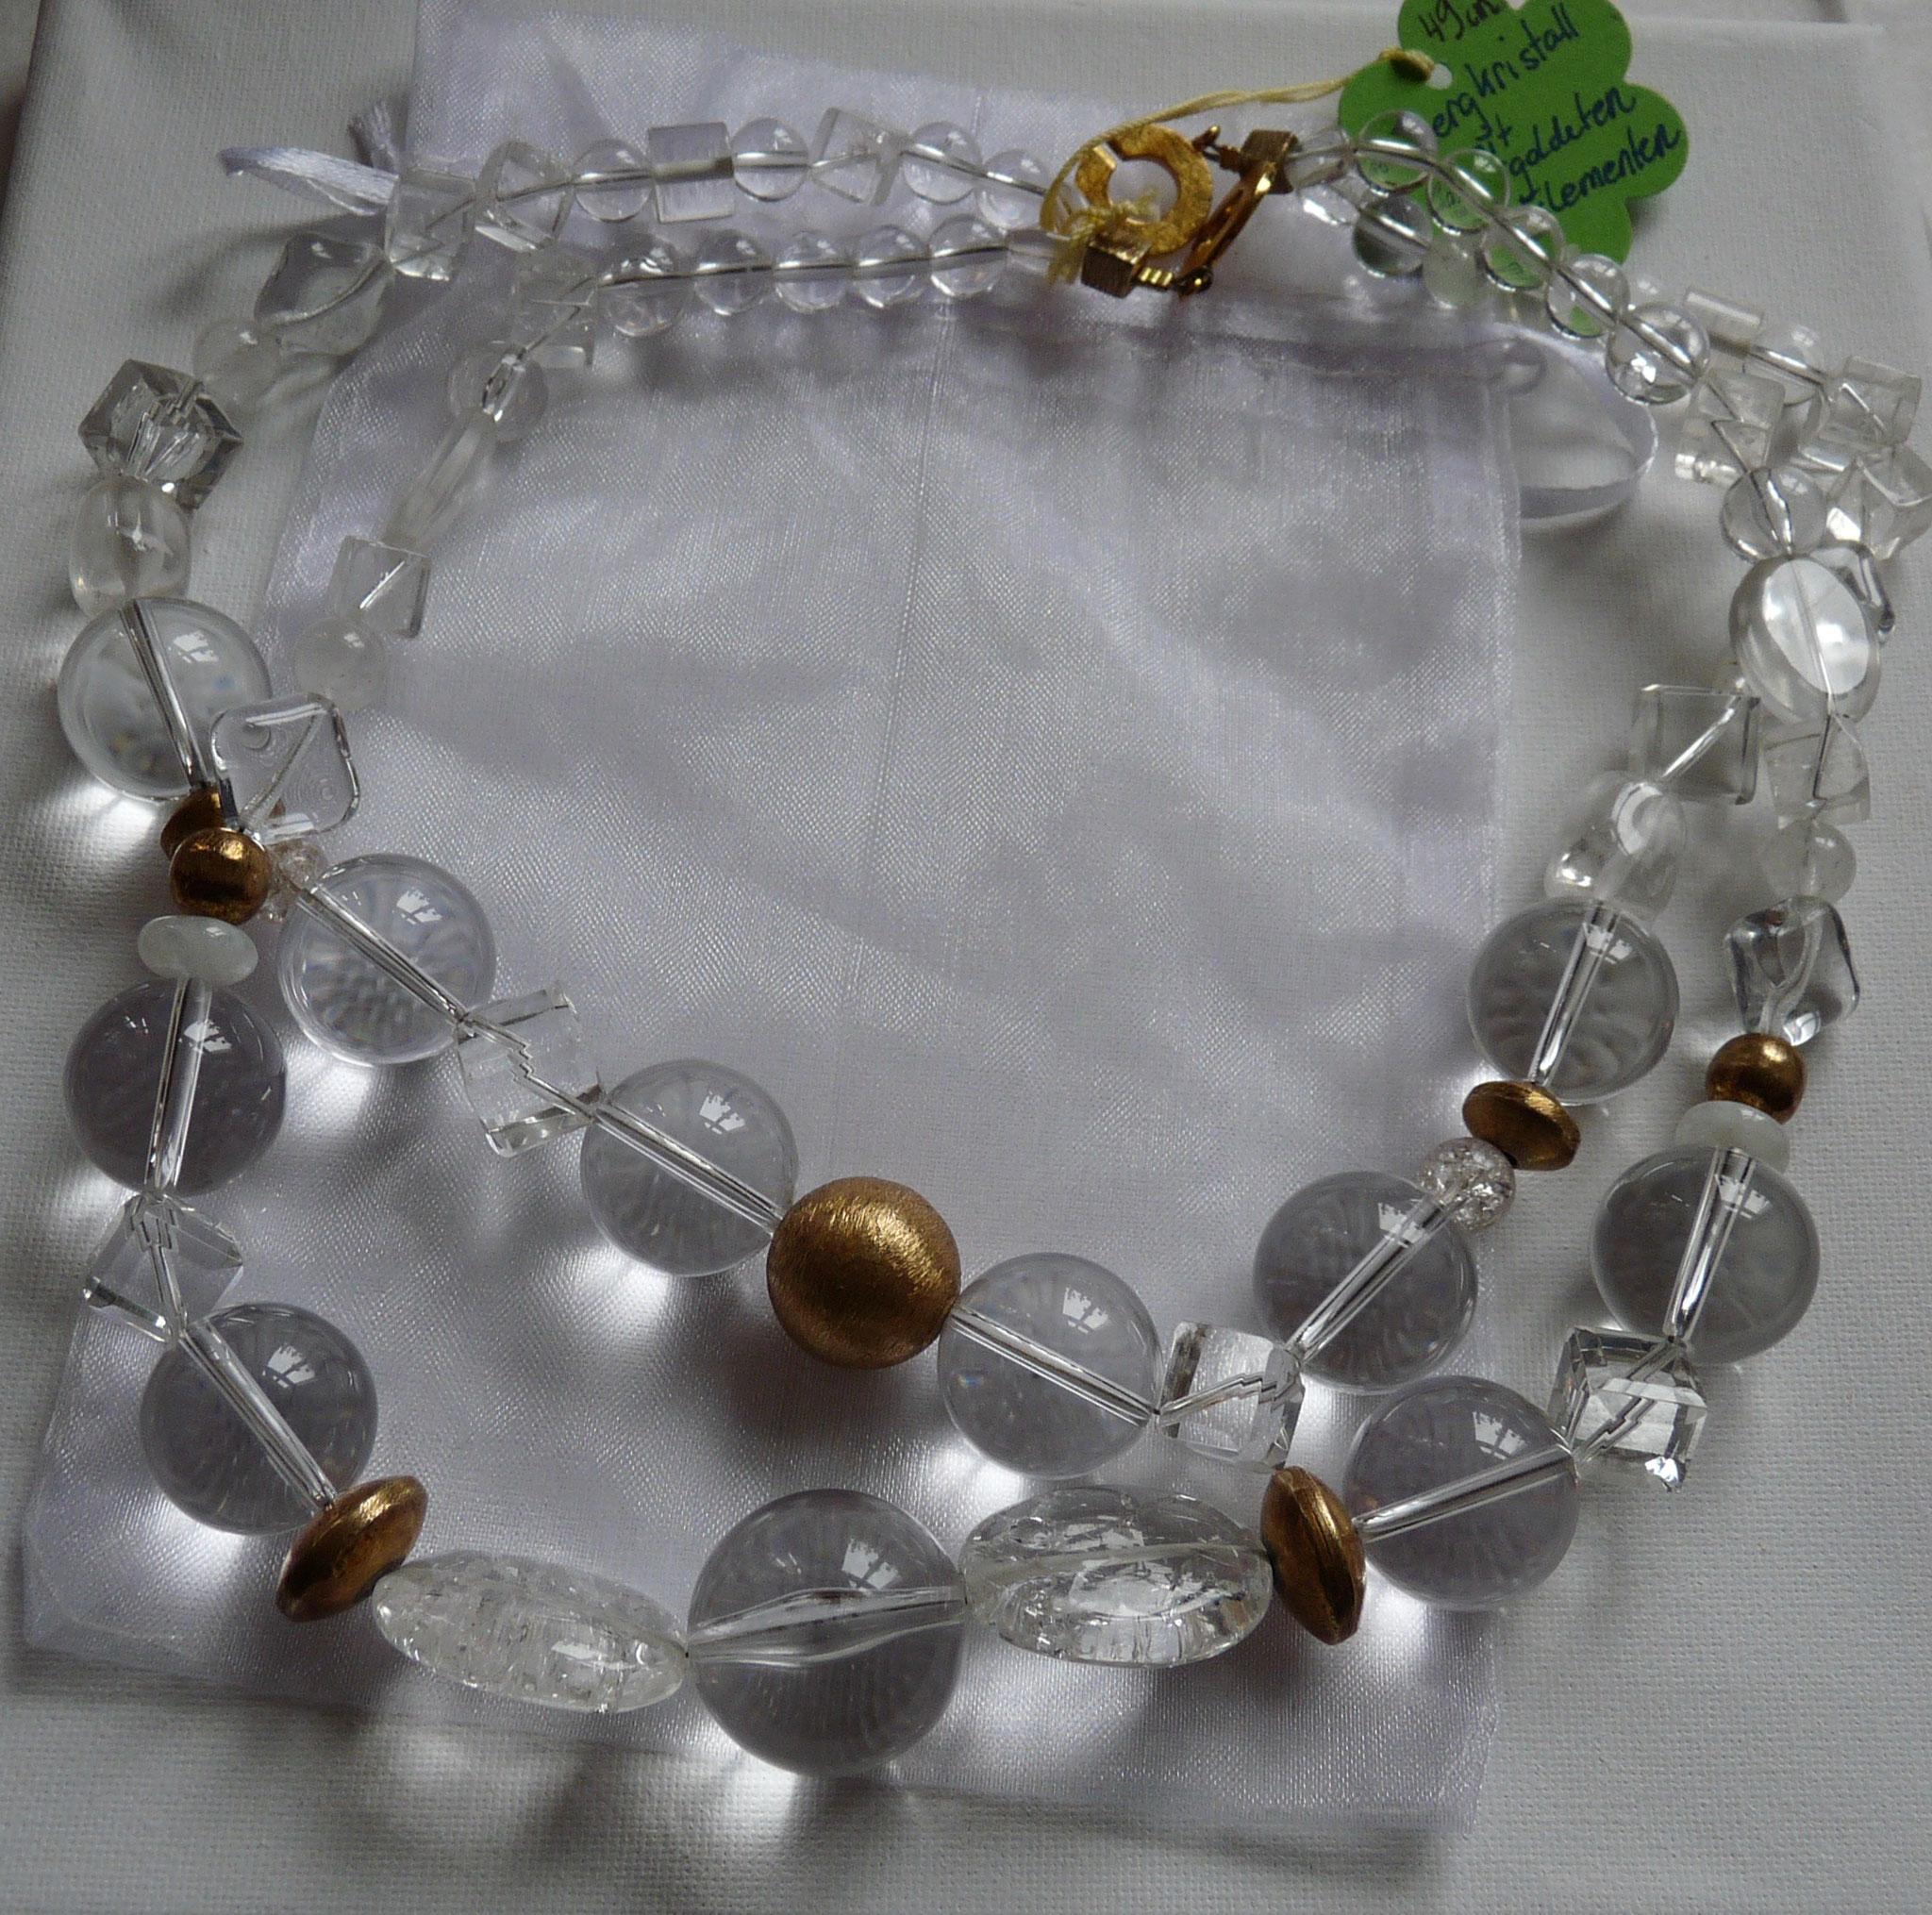 Bergkristall mit vergoldeten Elementen